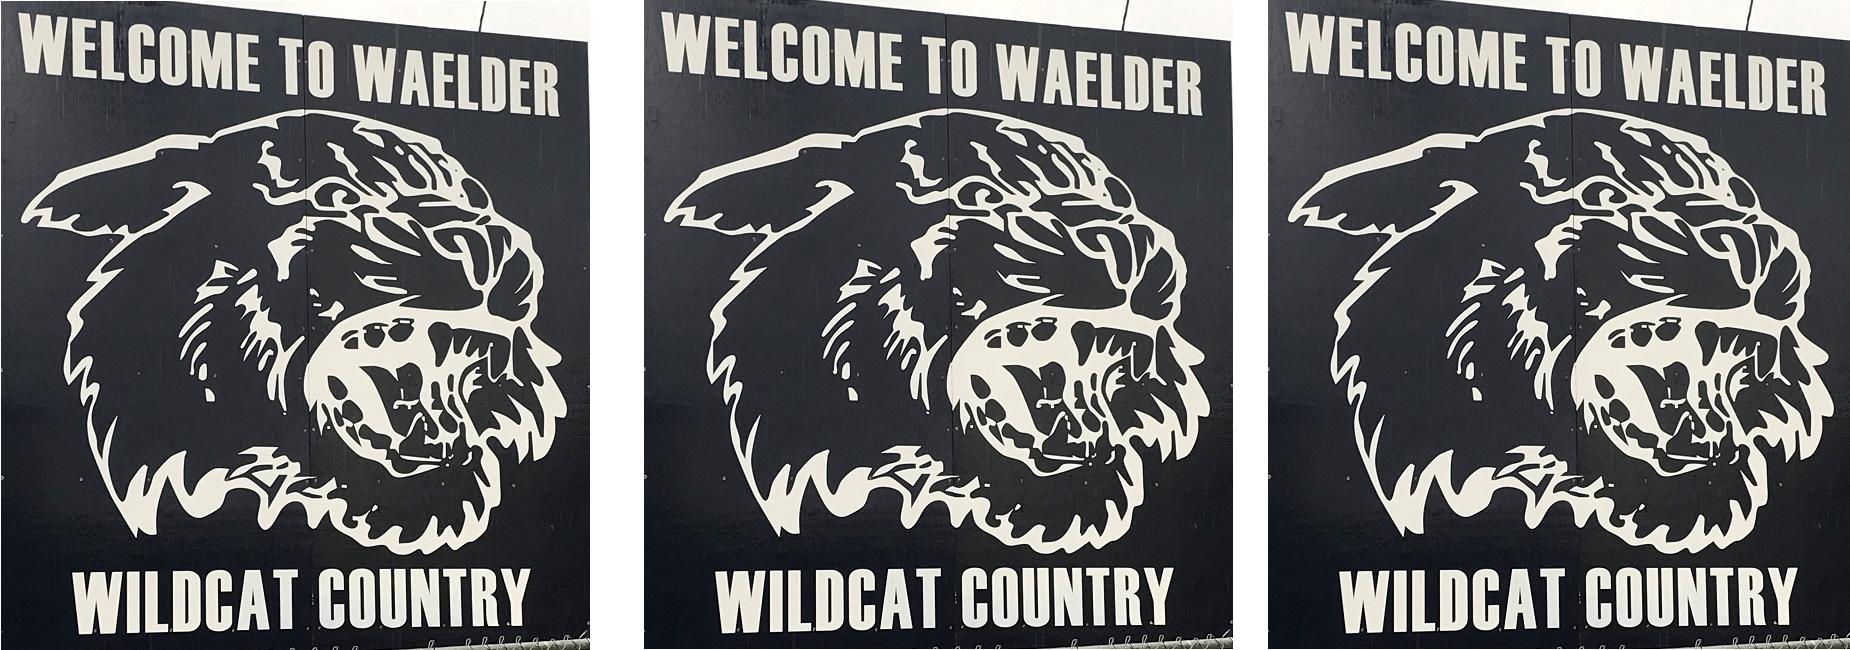 New Welcome to Waelder Sign